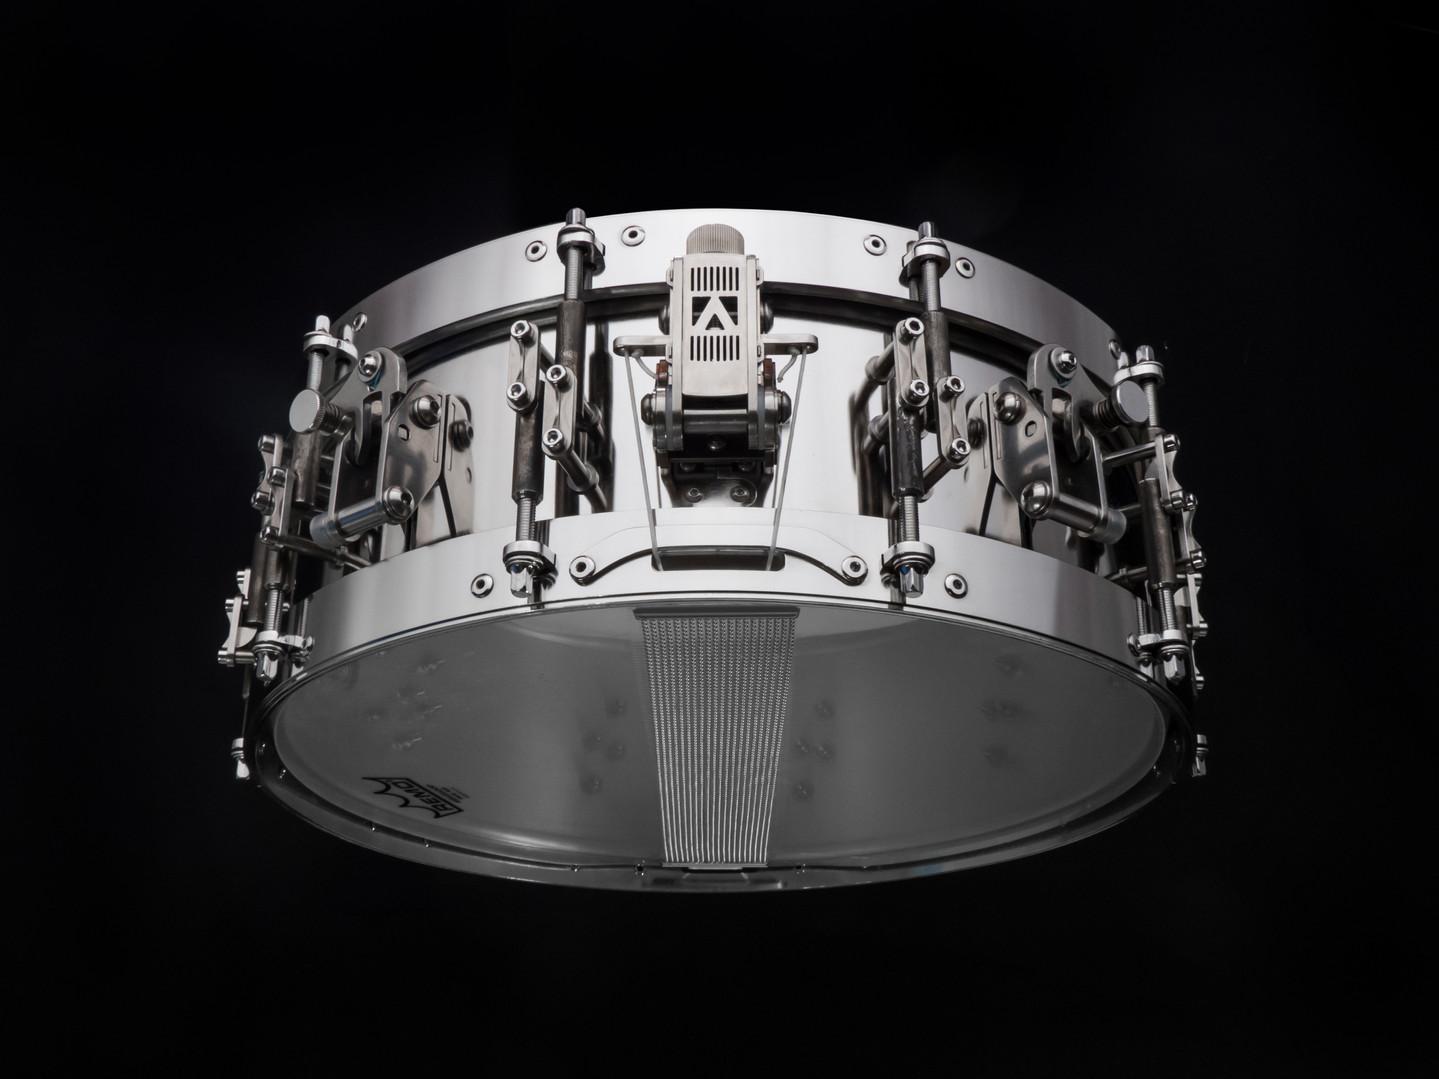 ARCANUM HC AIR Stainless Steel 14x5